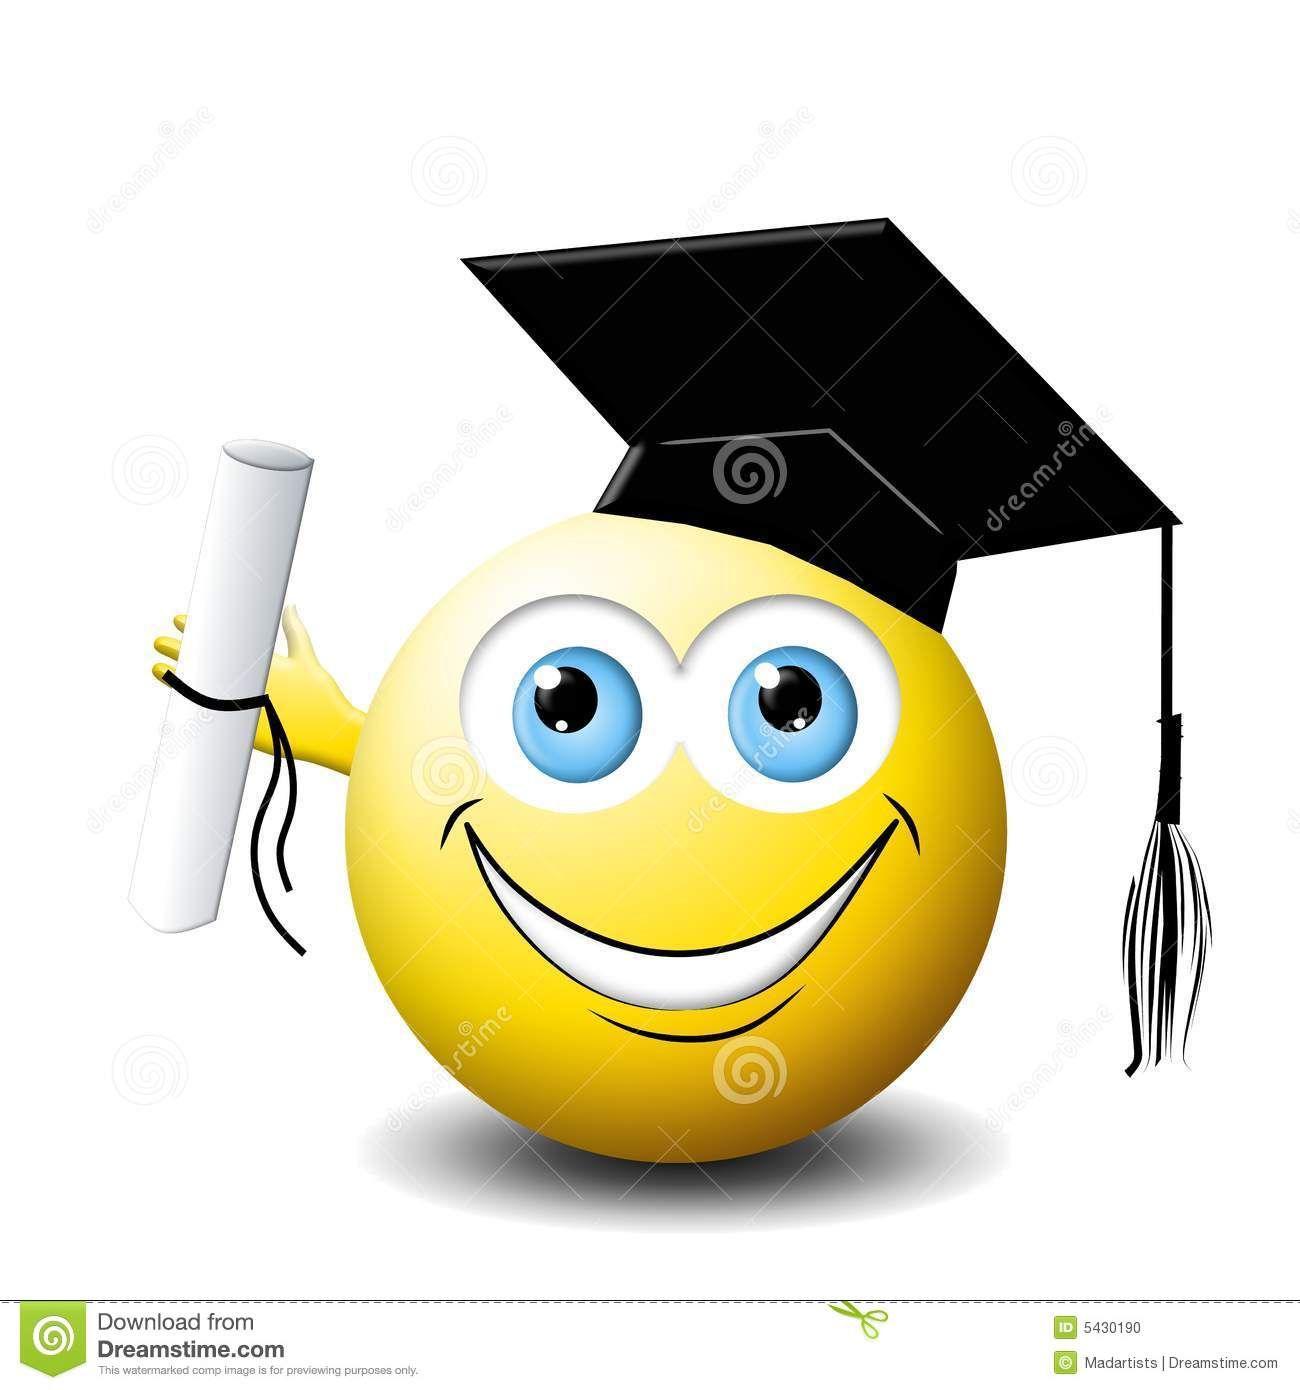 Smiley Face Graduate Smiley Face Smiley Emoji Image